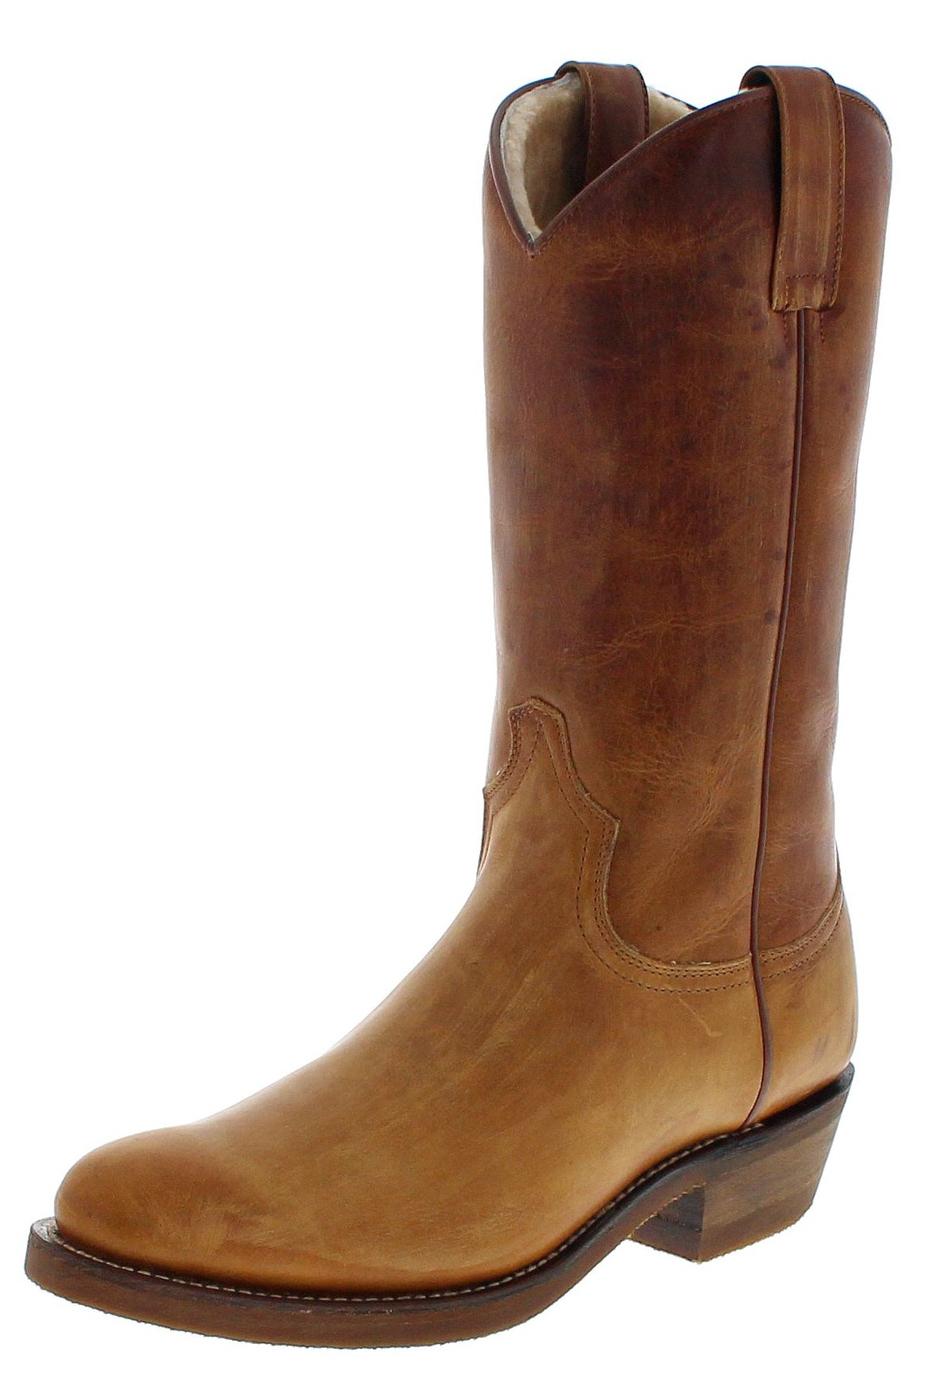 Sendra Boots 5588F Tang Herren Winter Westernstiefel mit Merinofell Futter - braun